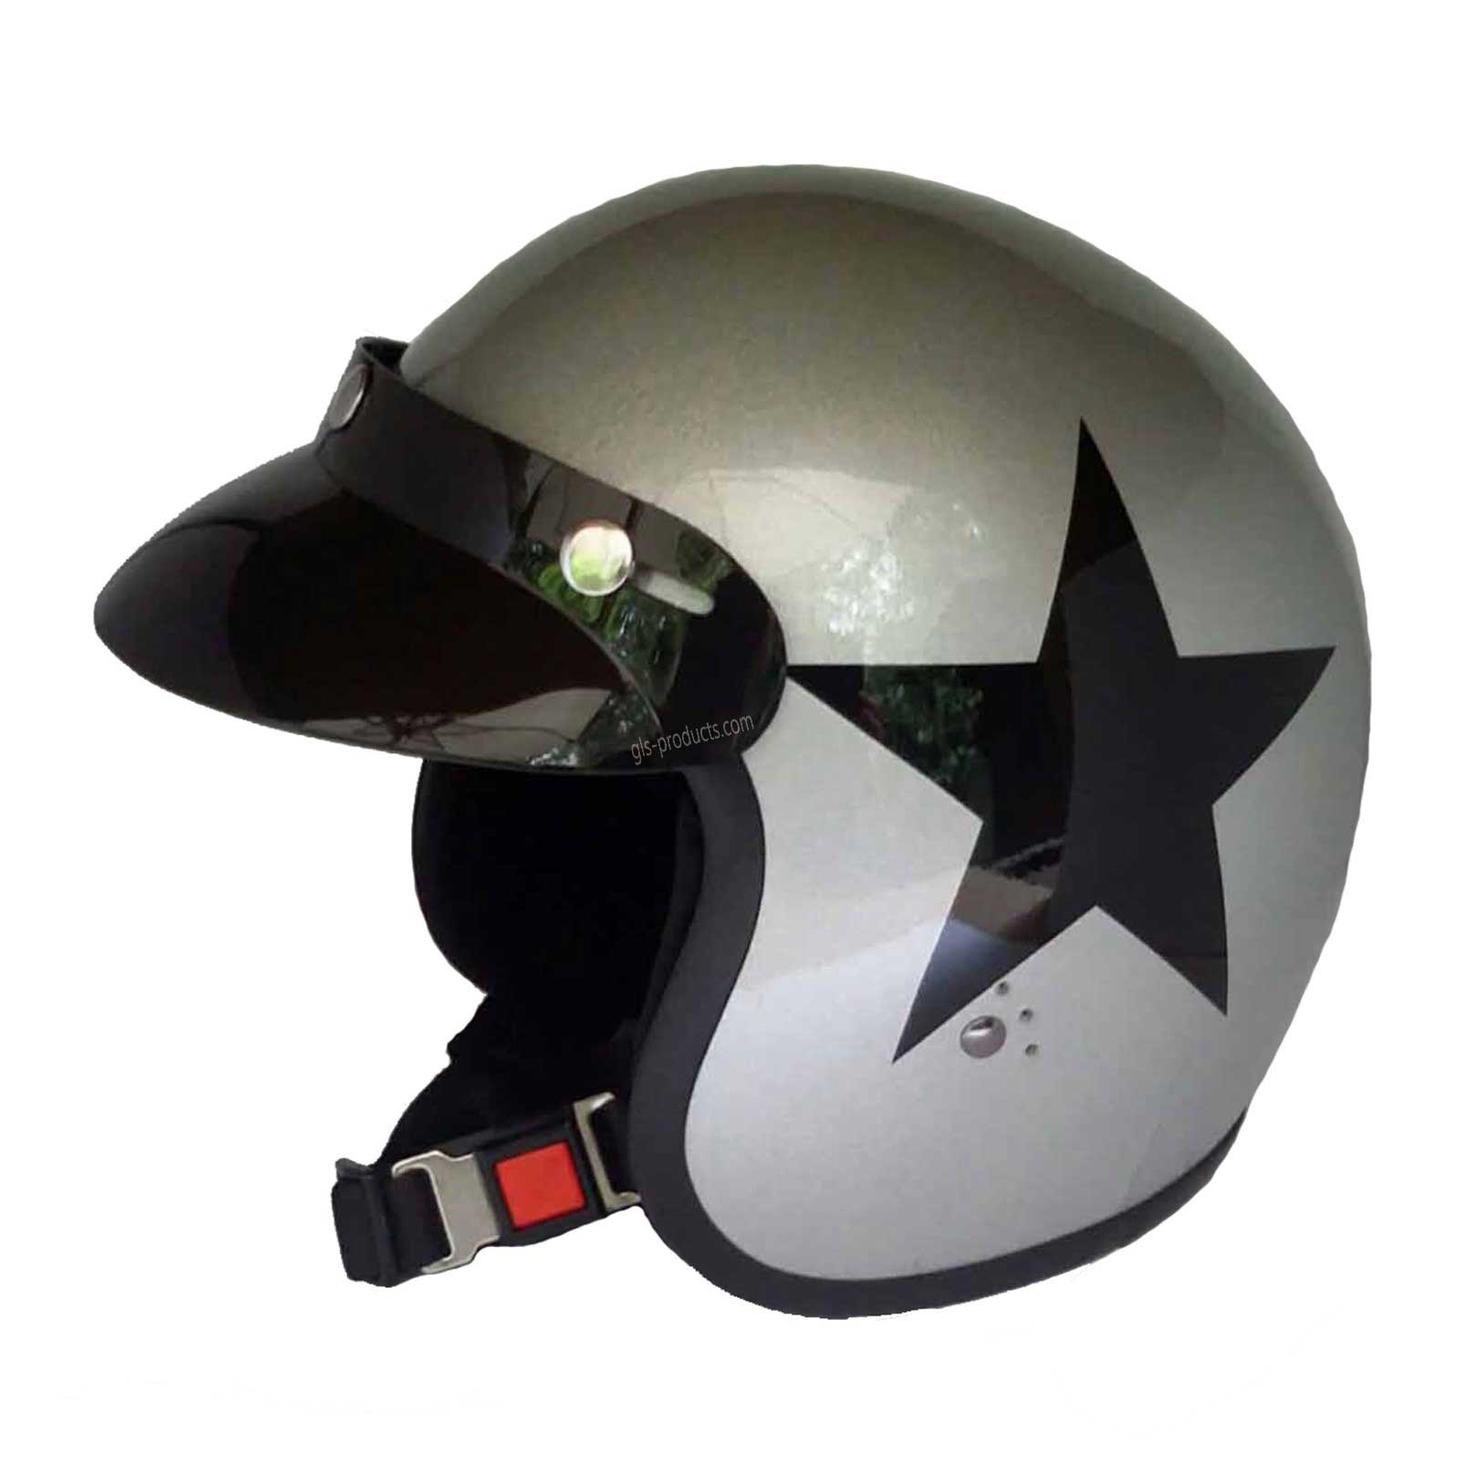 Bandit Star Silver Original Jet Helmet - Silver Motorcycle Helmet – Picture 2